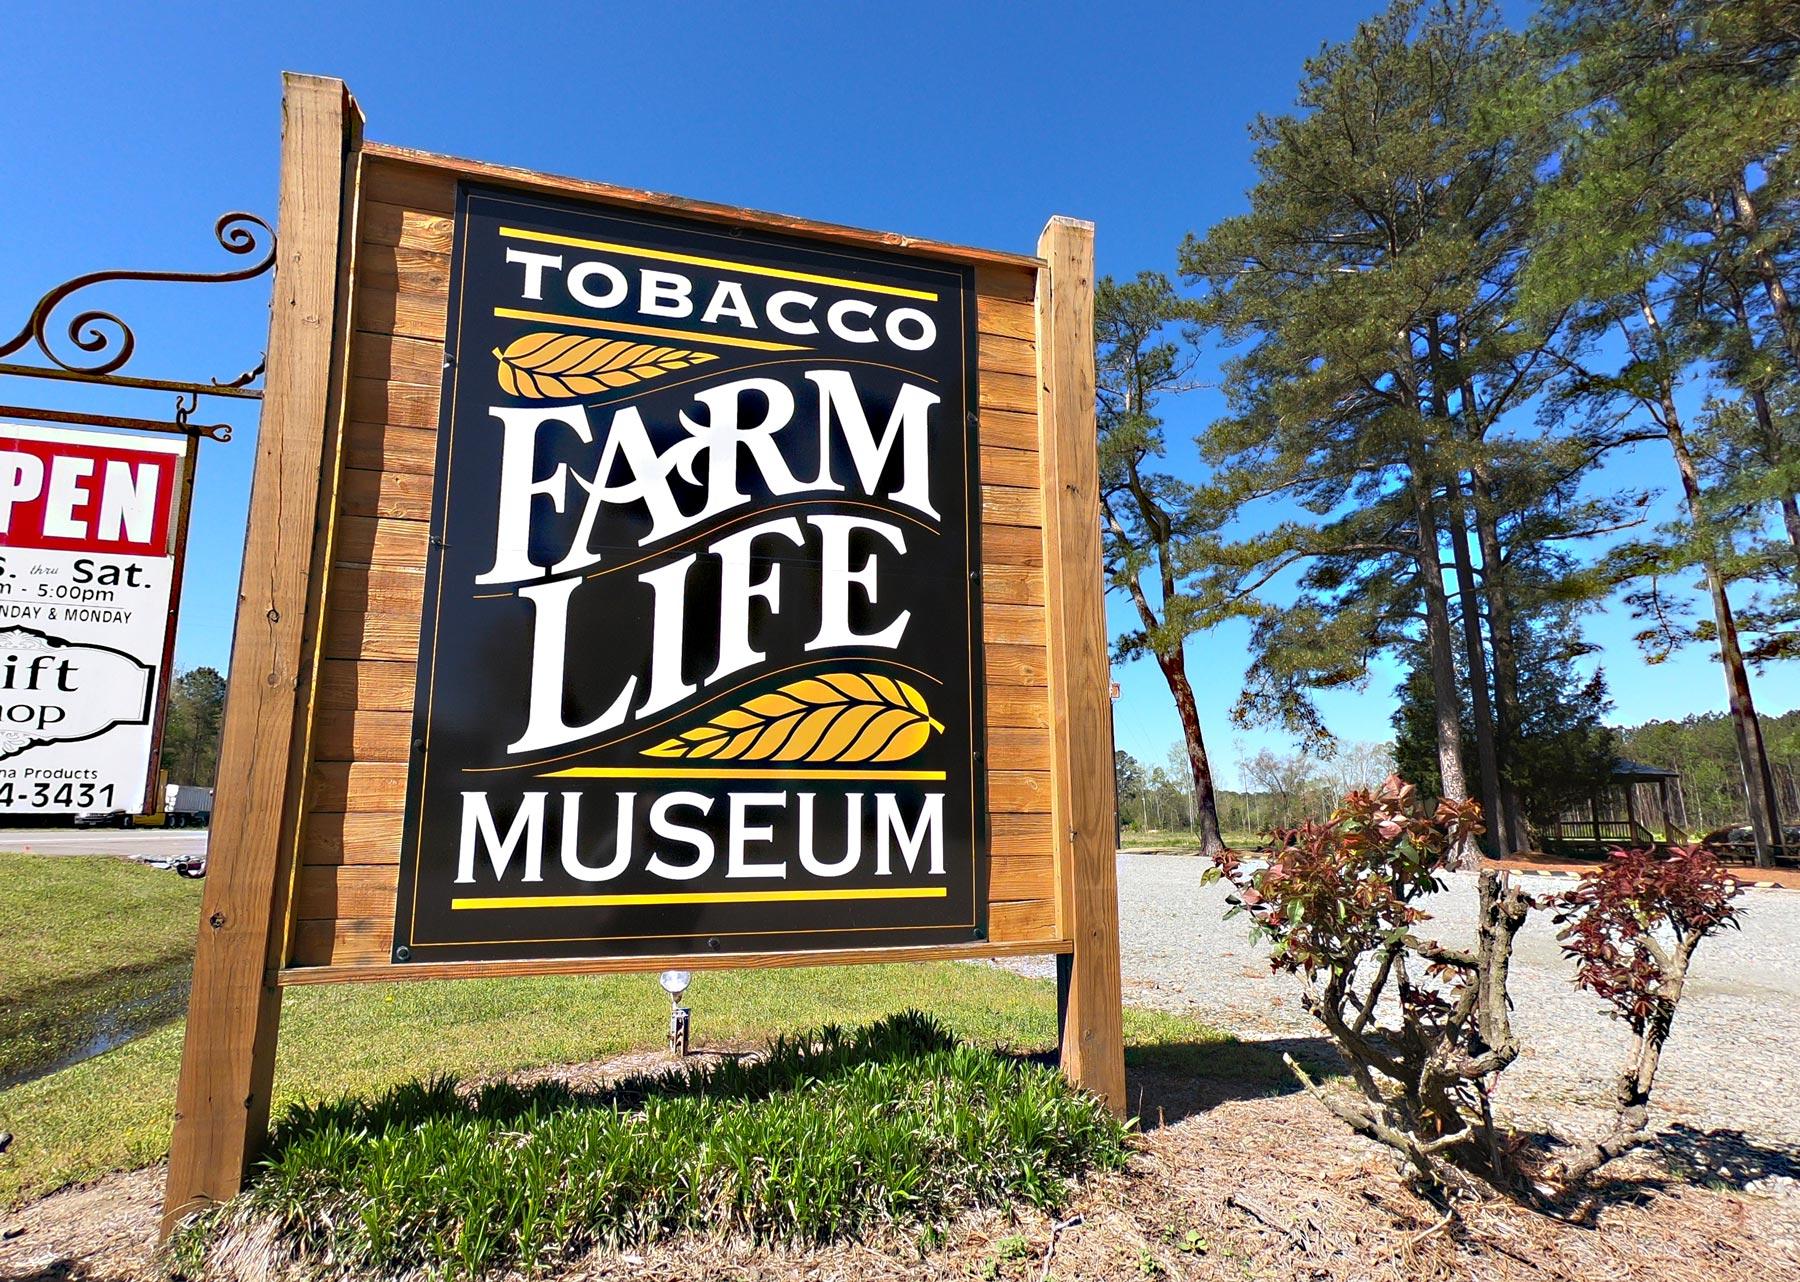 Road entrance signage and visit Tobacco Farm Life Museum, Kenly, North Carolina